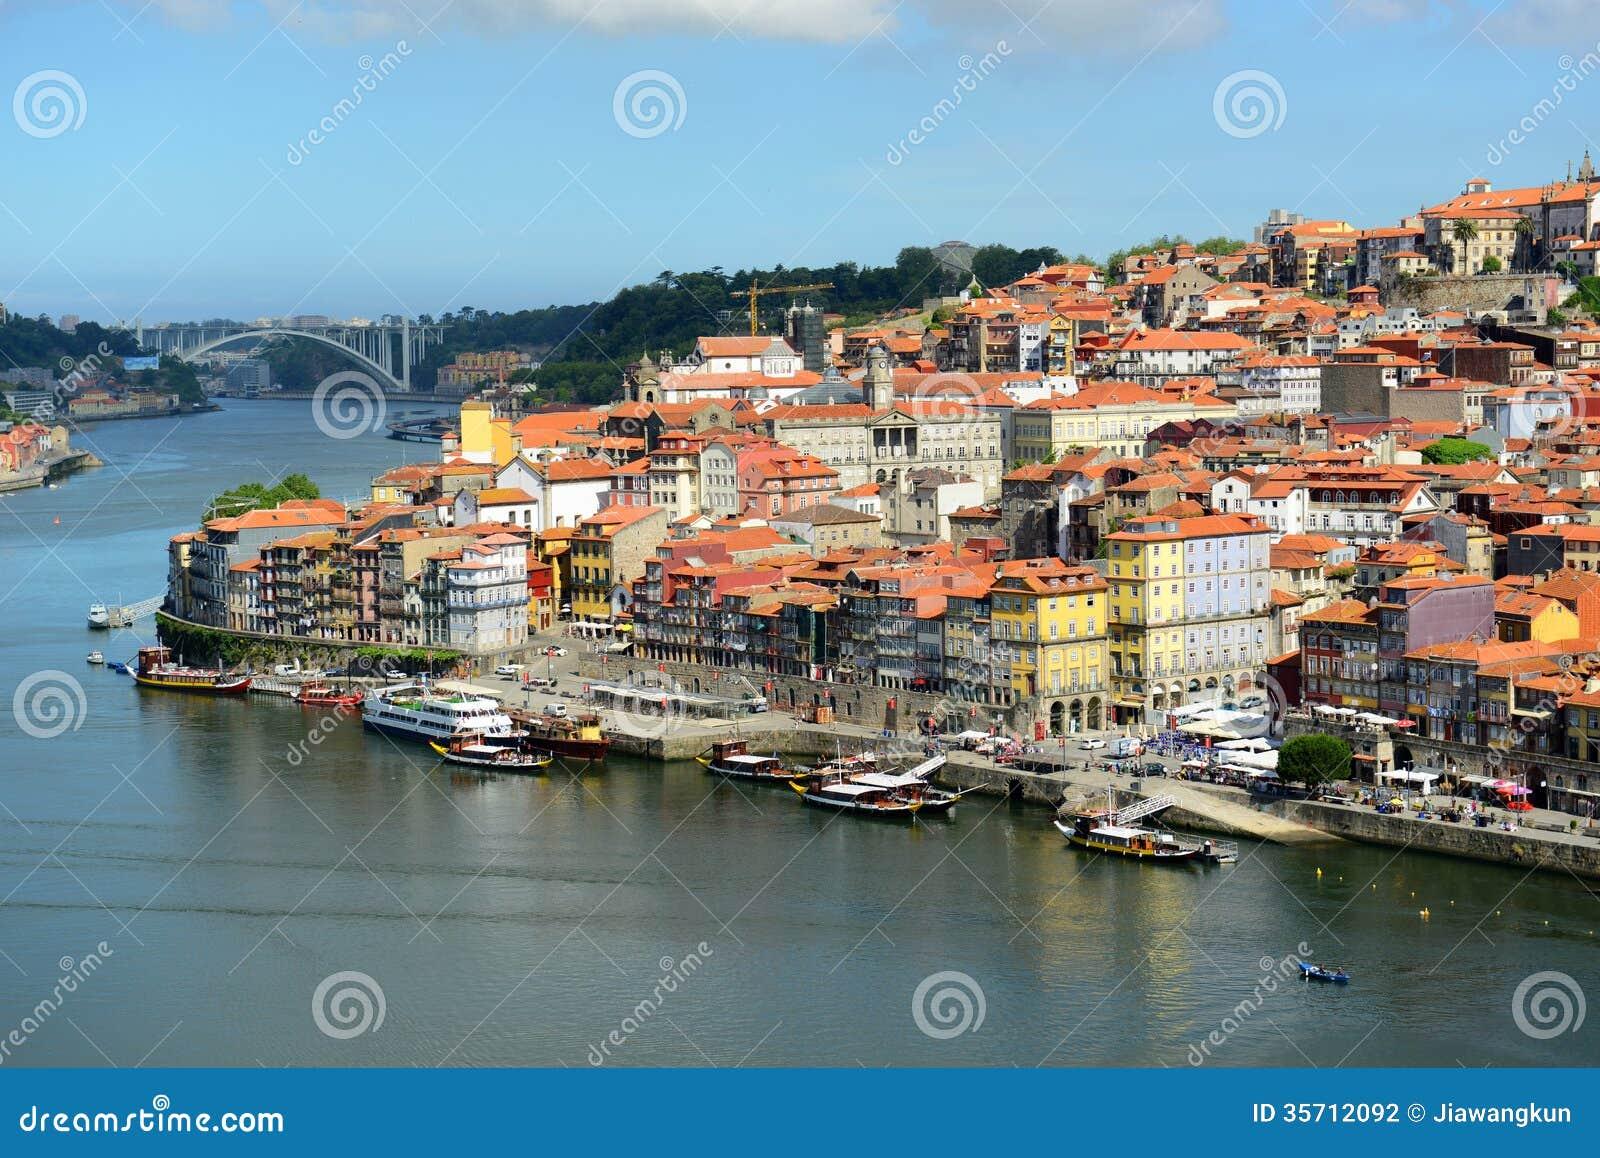 Vieille vue de rivi re de ville de porto porto portugal for Piscine a porto portugal